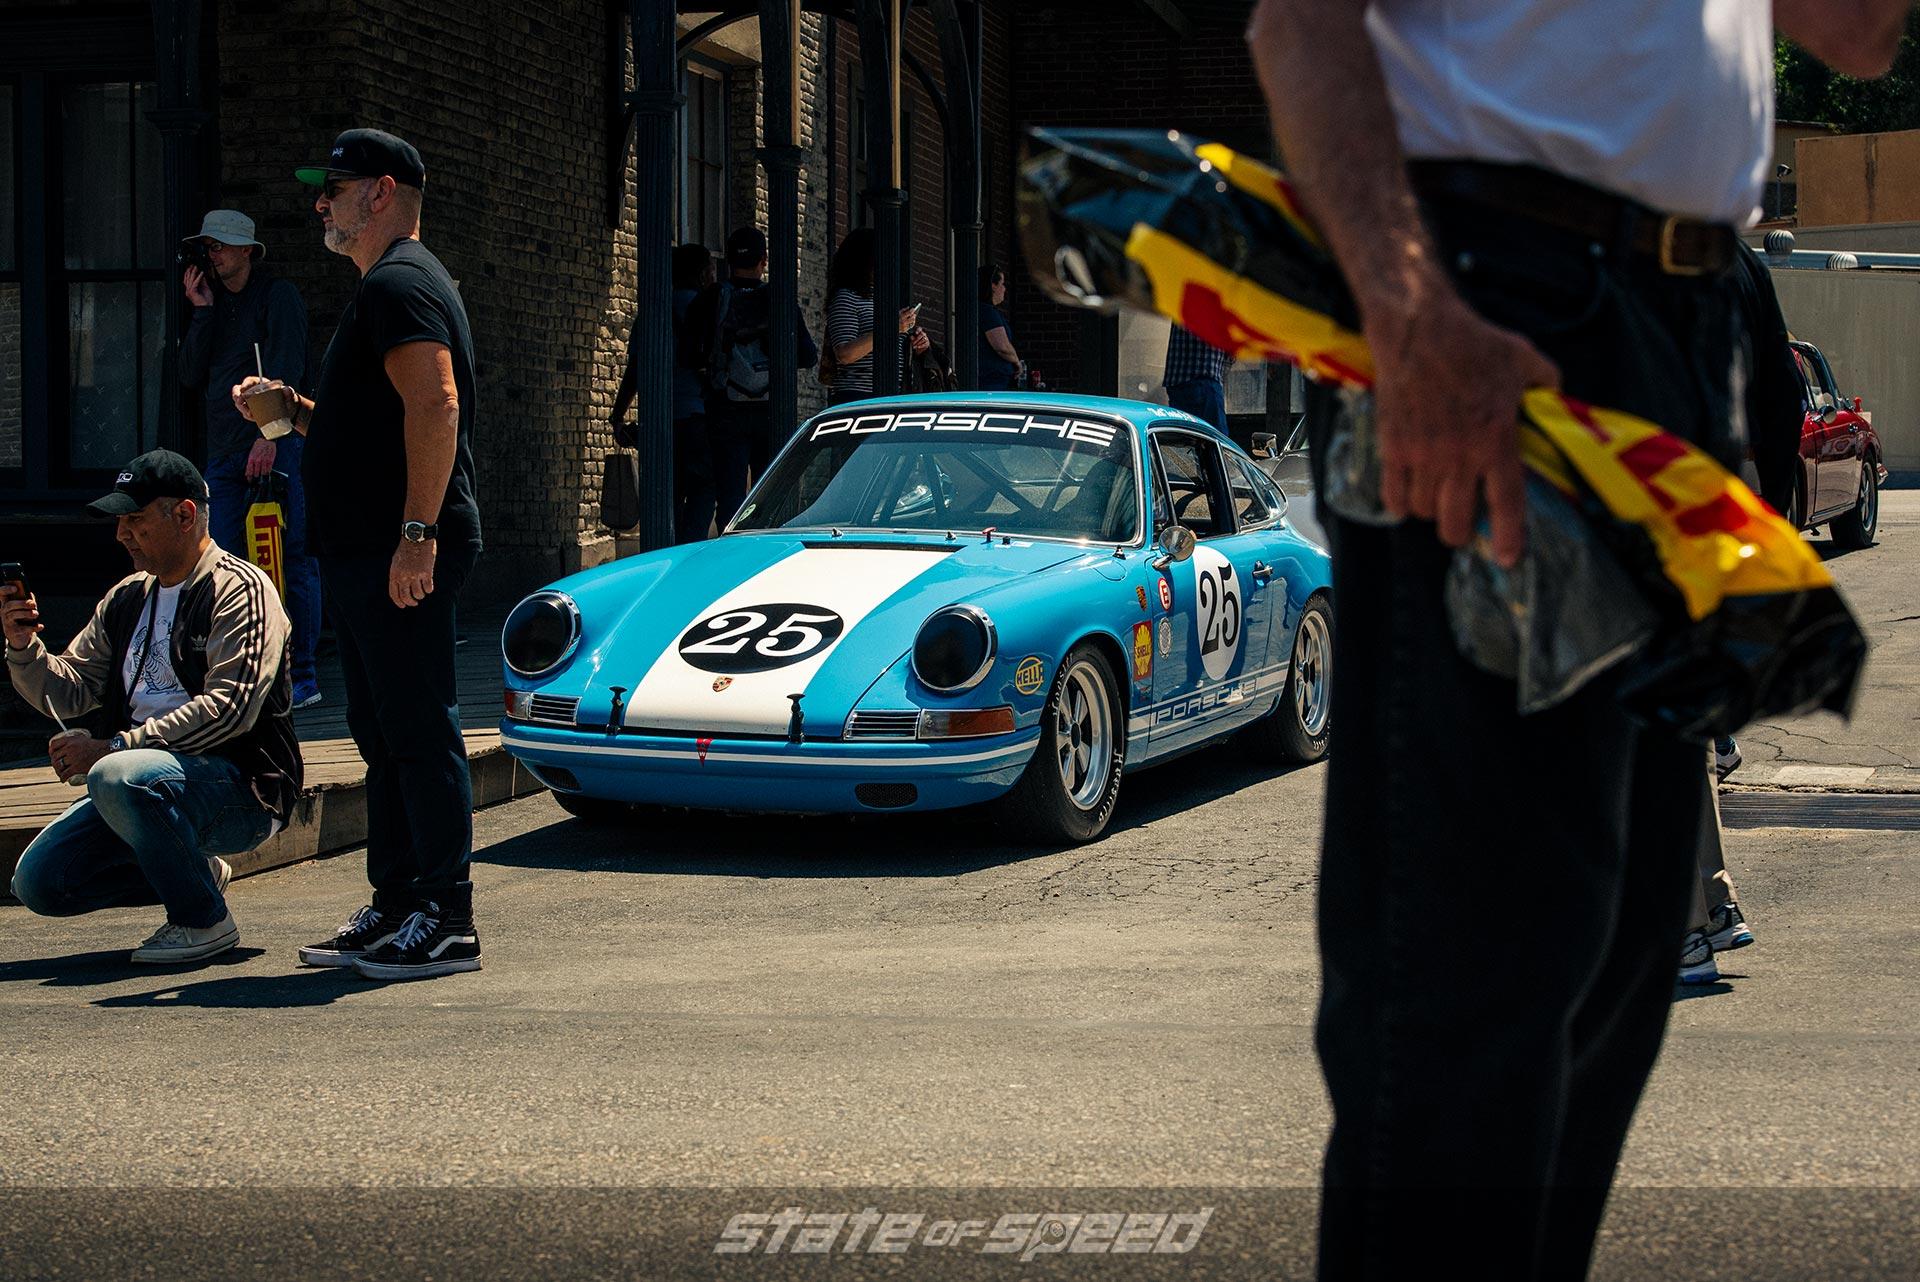 #25 Porsche at Luftgekühlt 6